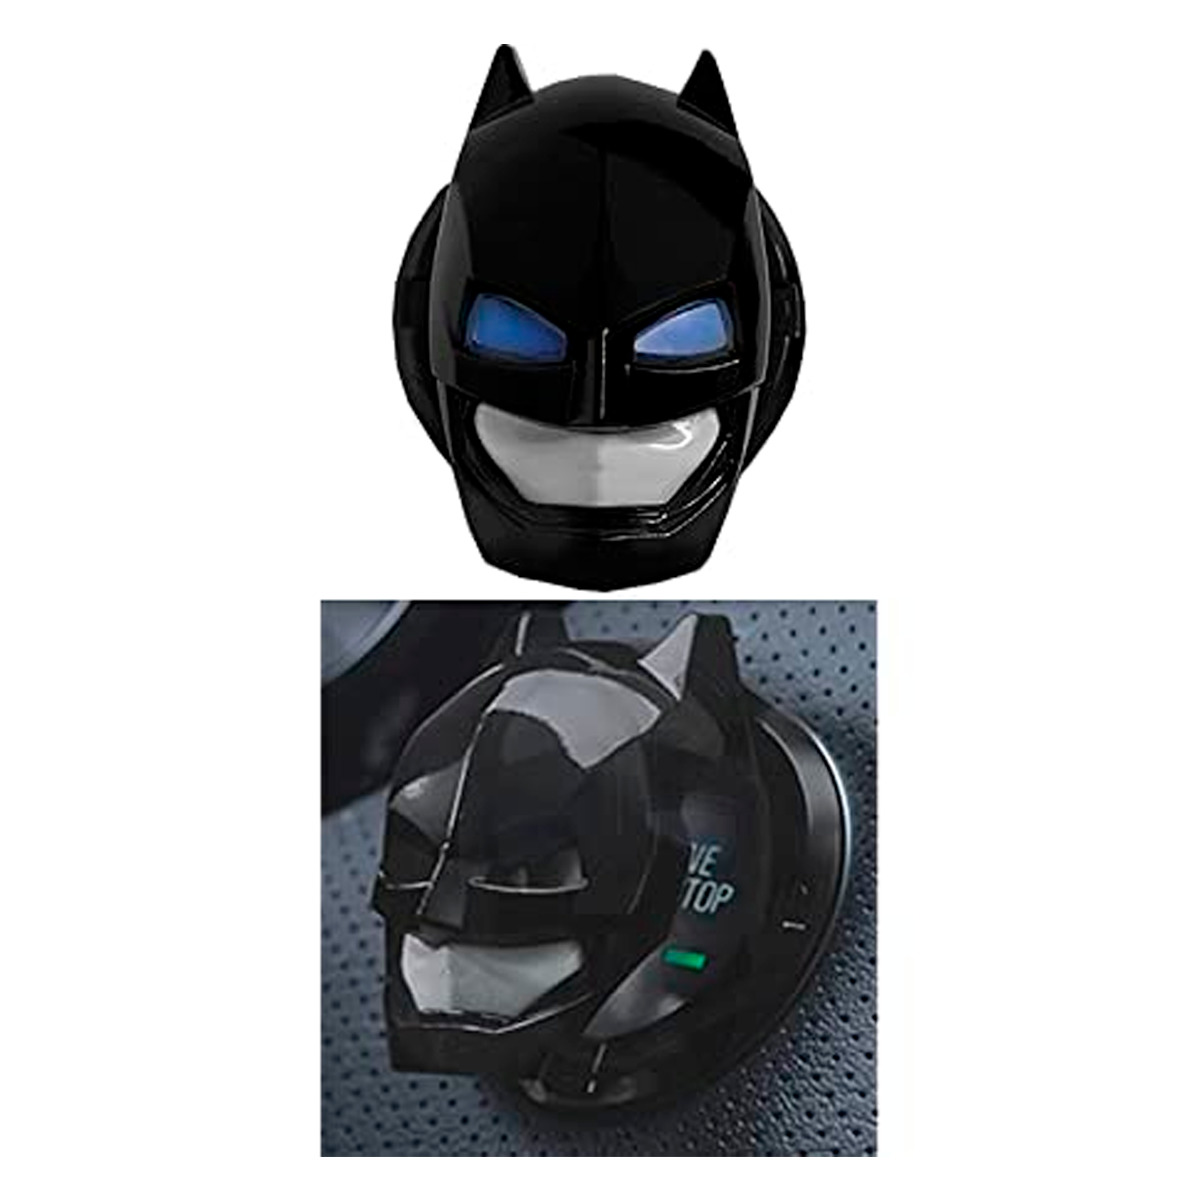 Protector Para Botón Encendido Batman Plástico